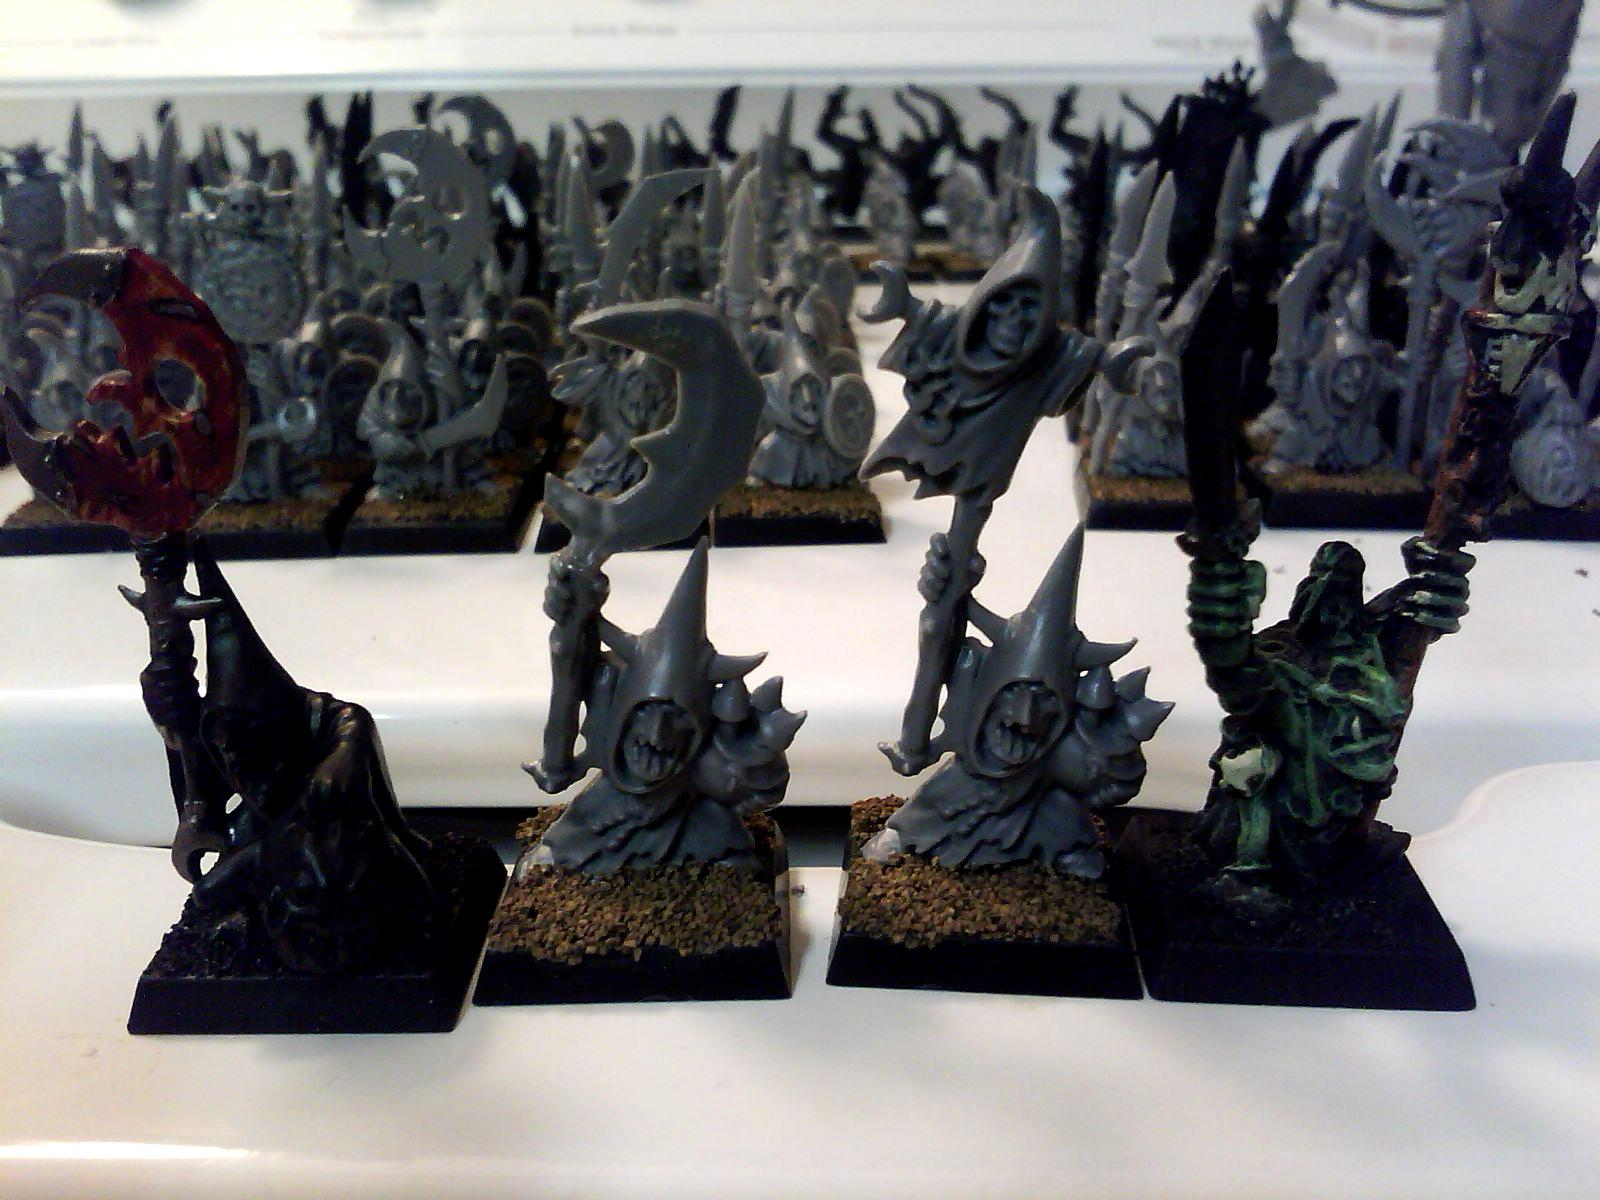 Gobbos, Night Goblins, Sale